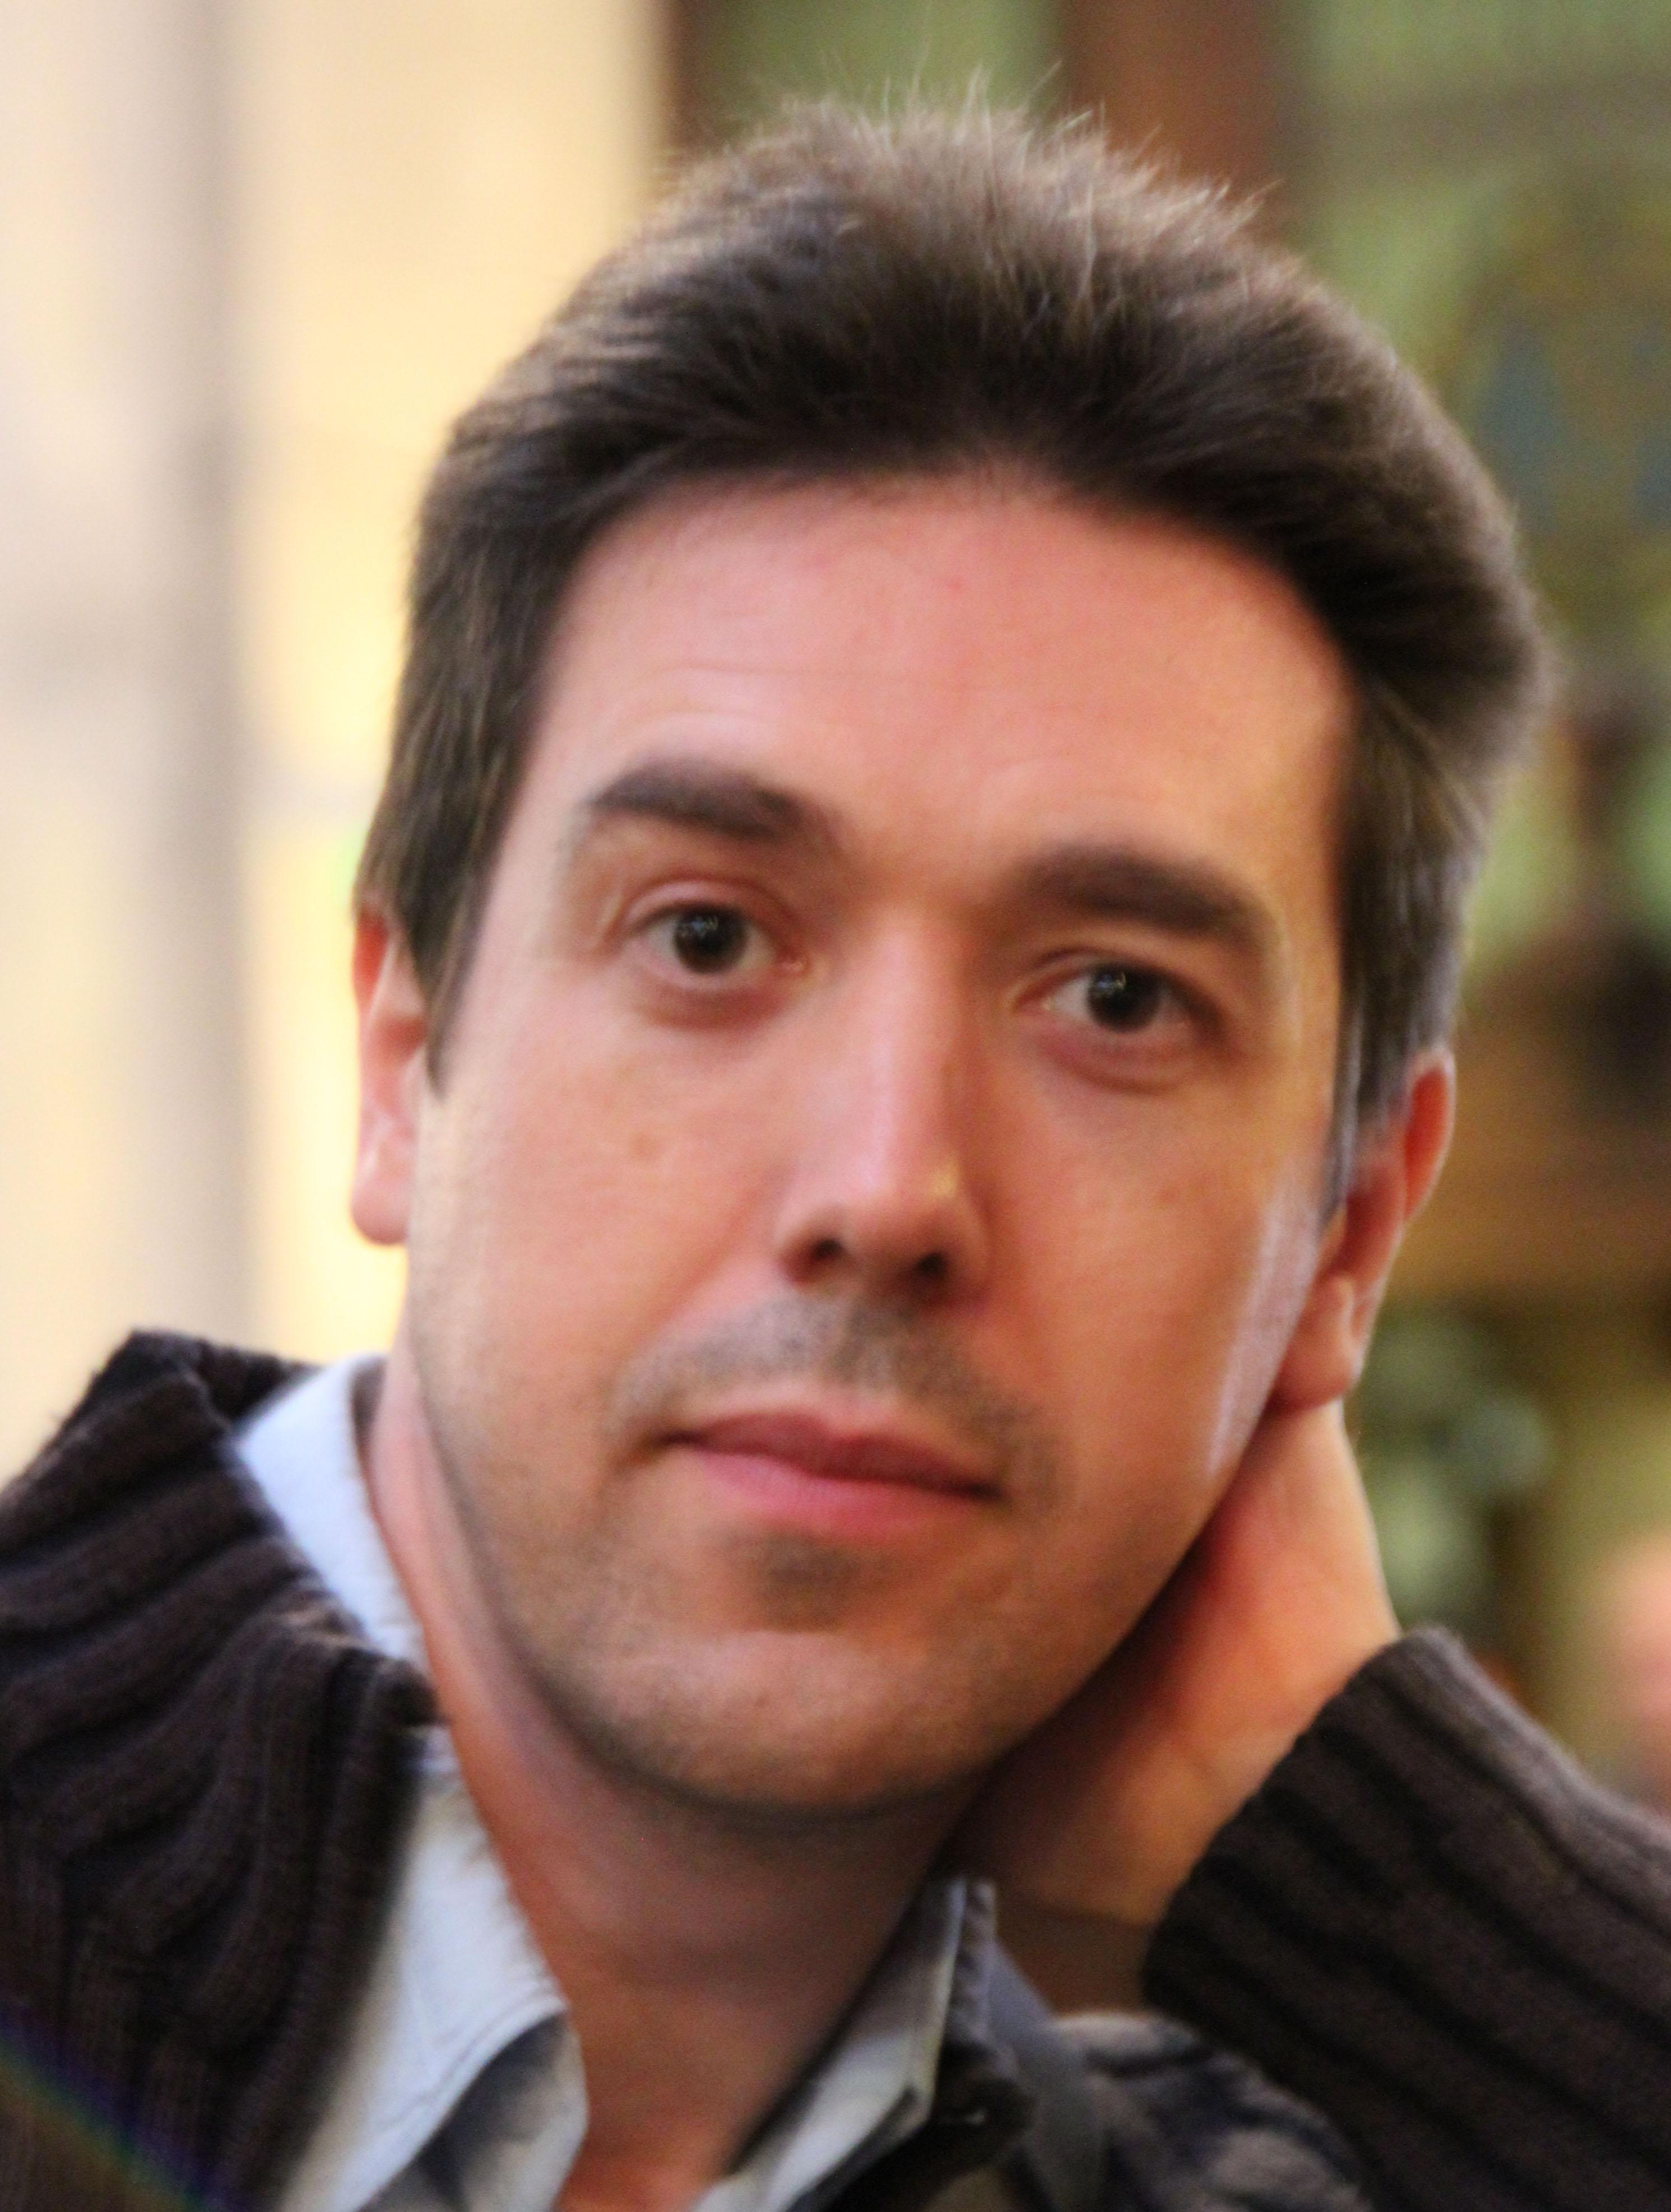 AntonioDaSilva